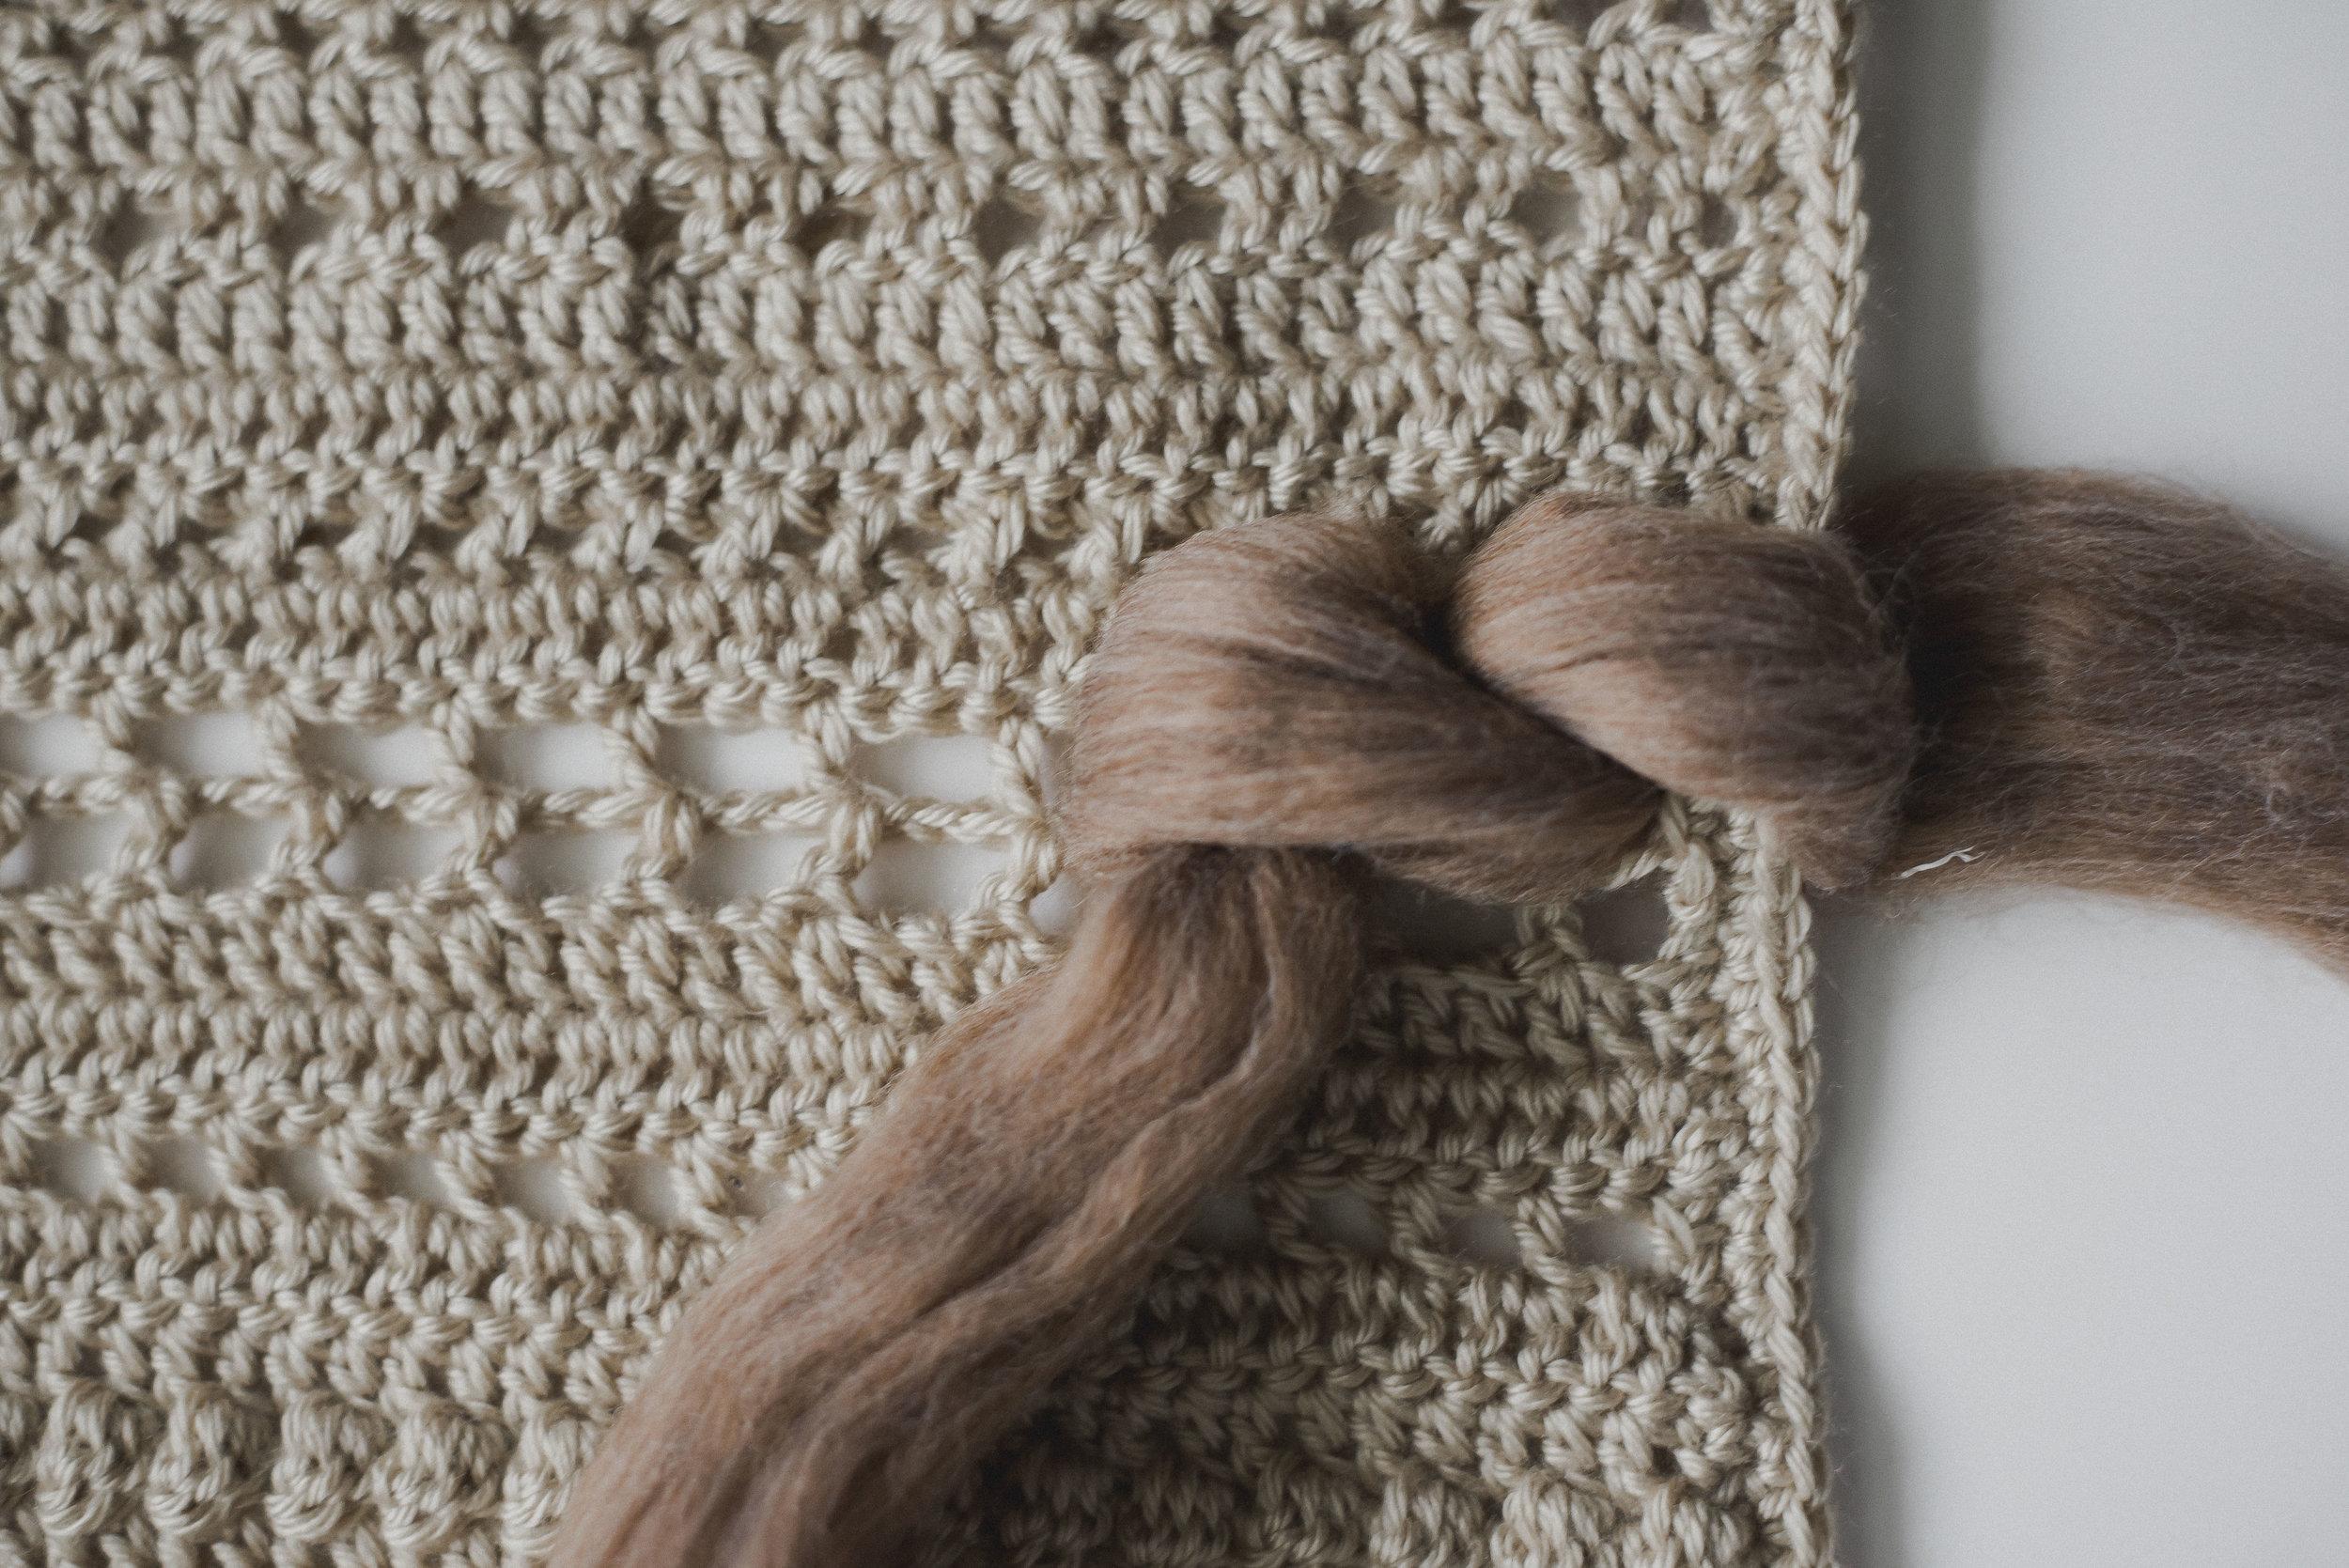 Crochet Woven Wall Hanging